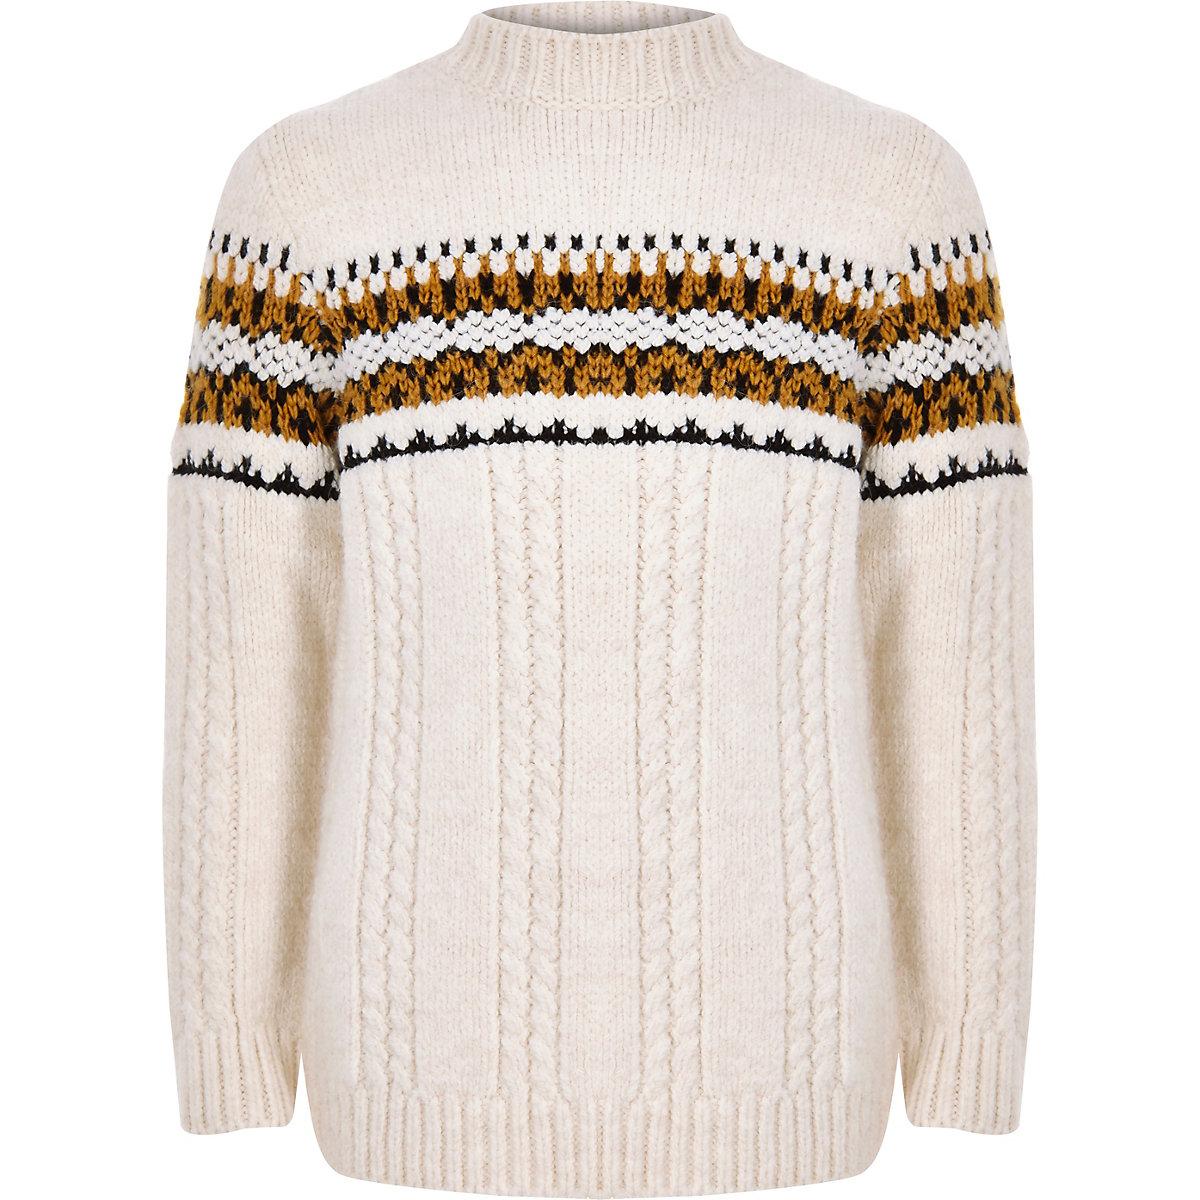 Boys ecru cable knit block high neck sweater